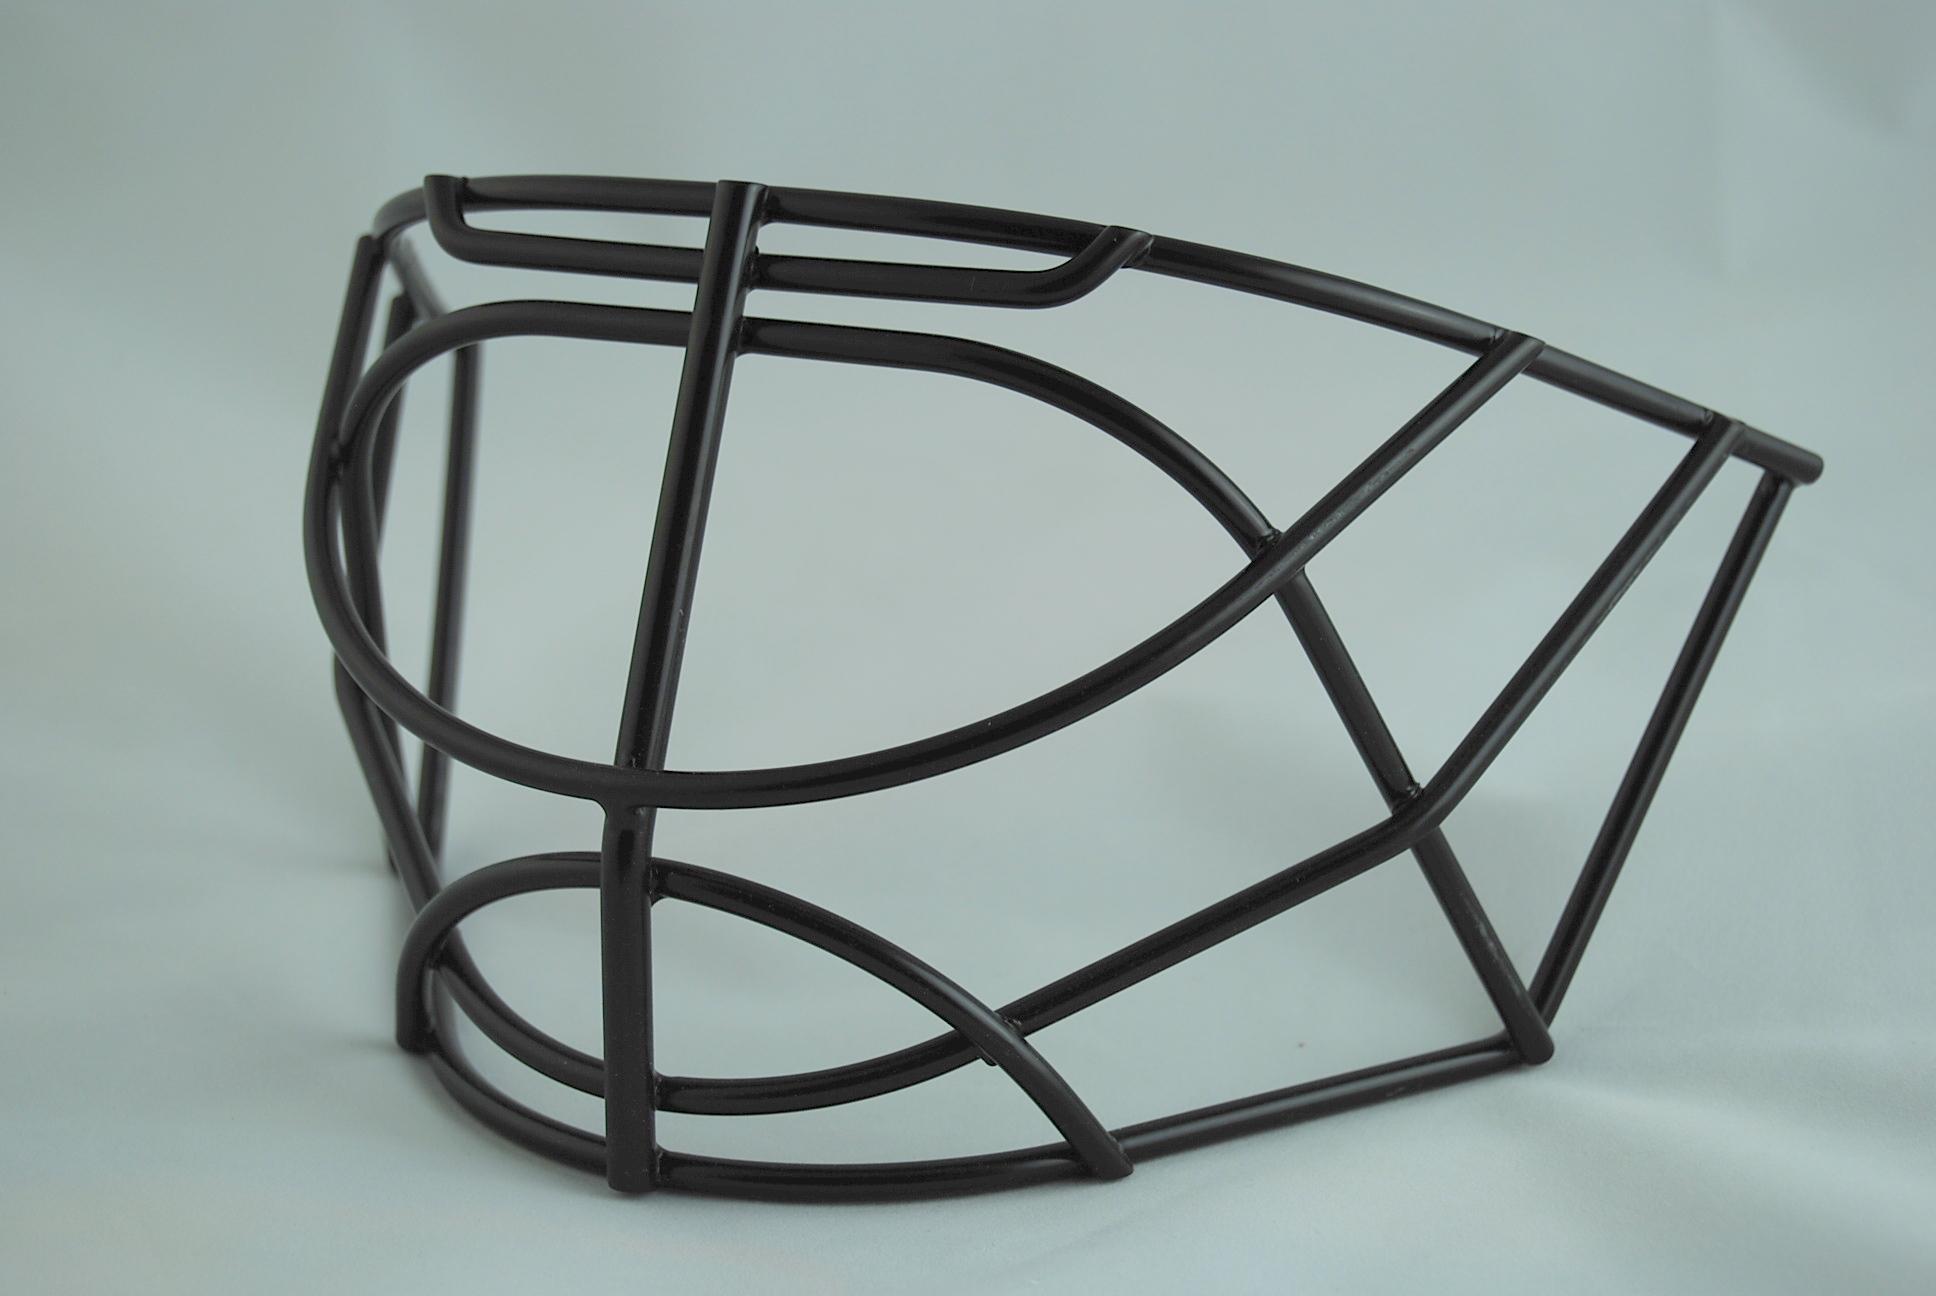 0506ad902a6 NME Concept Cateye Singlebar Cage Black – GOALIECAGES.COM